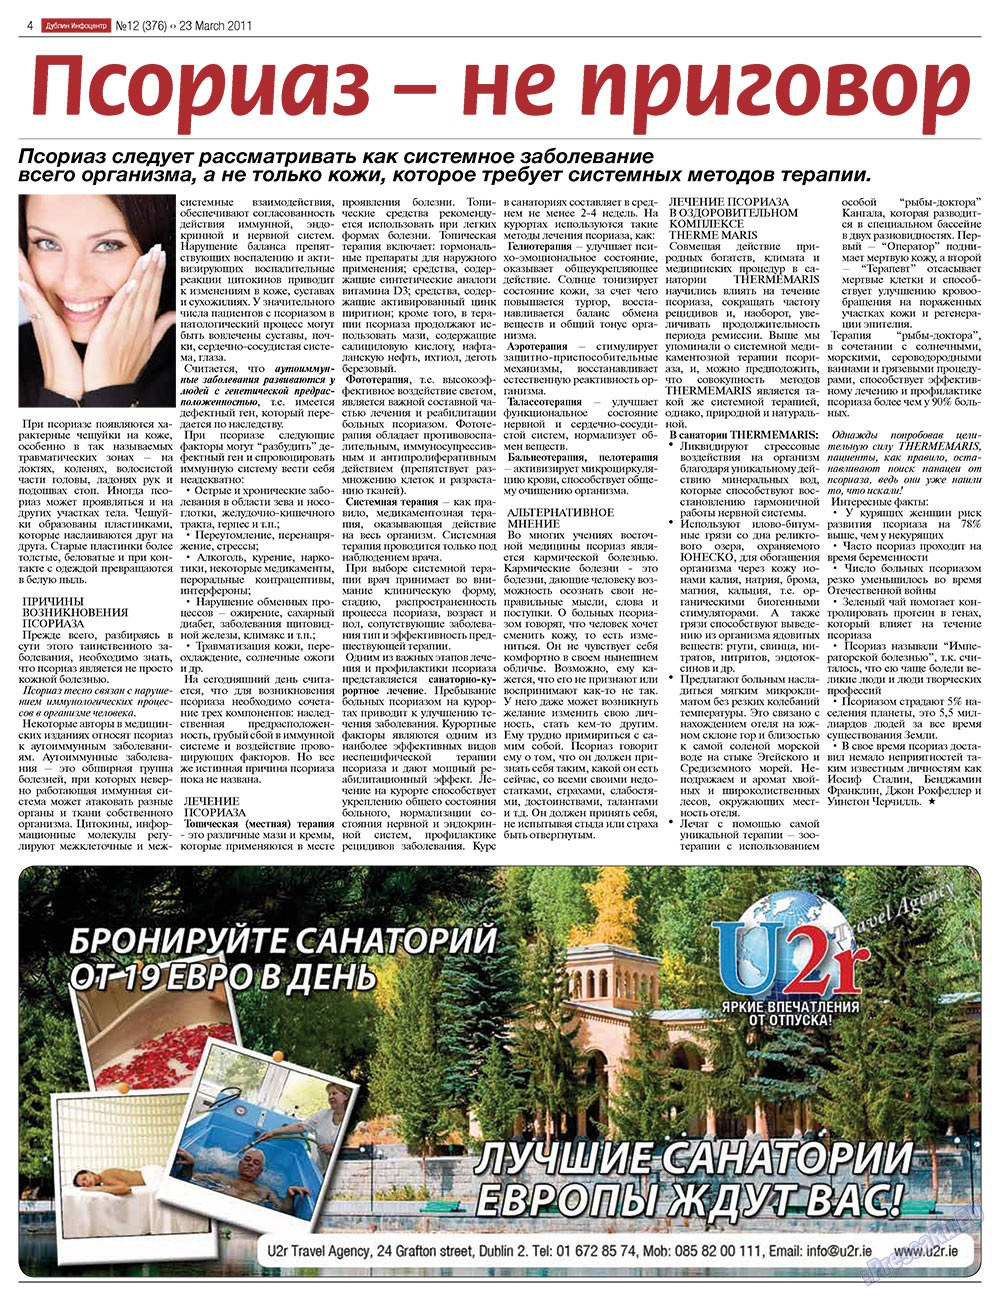 Дублин инфоцентр (газета). 2011 год, номер 12, стр. 4